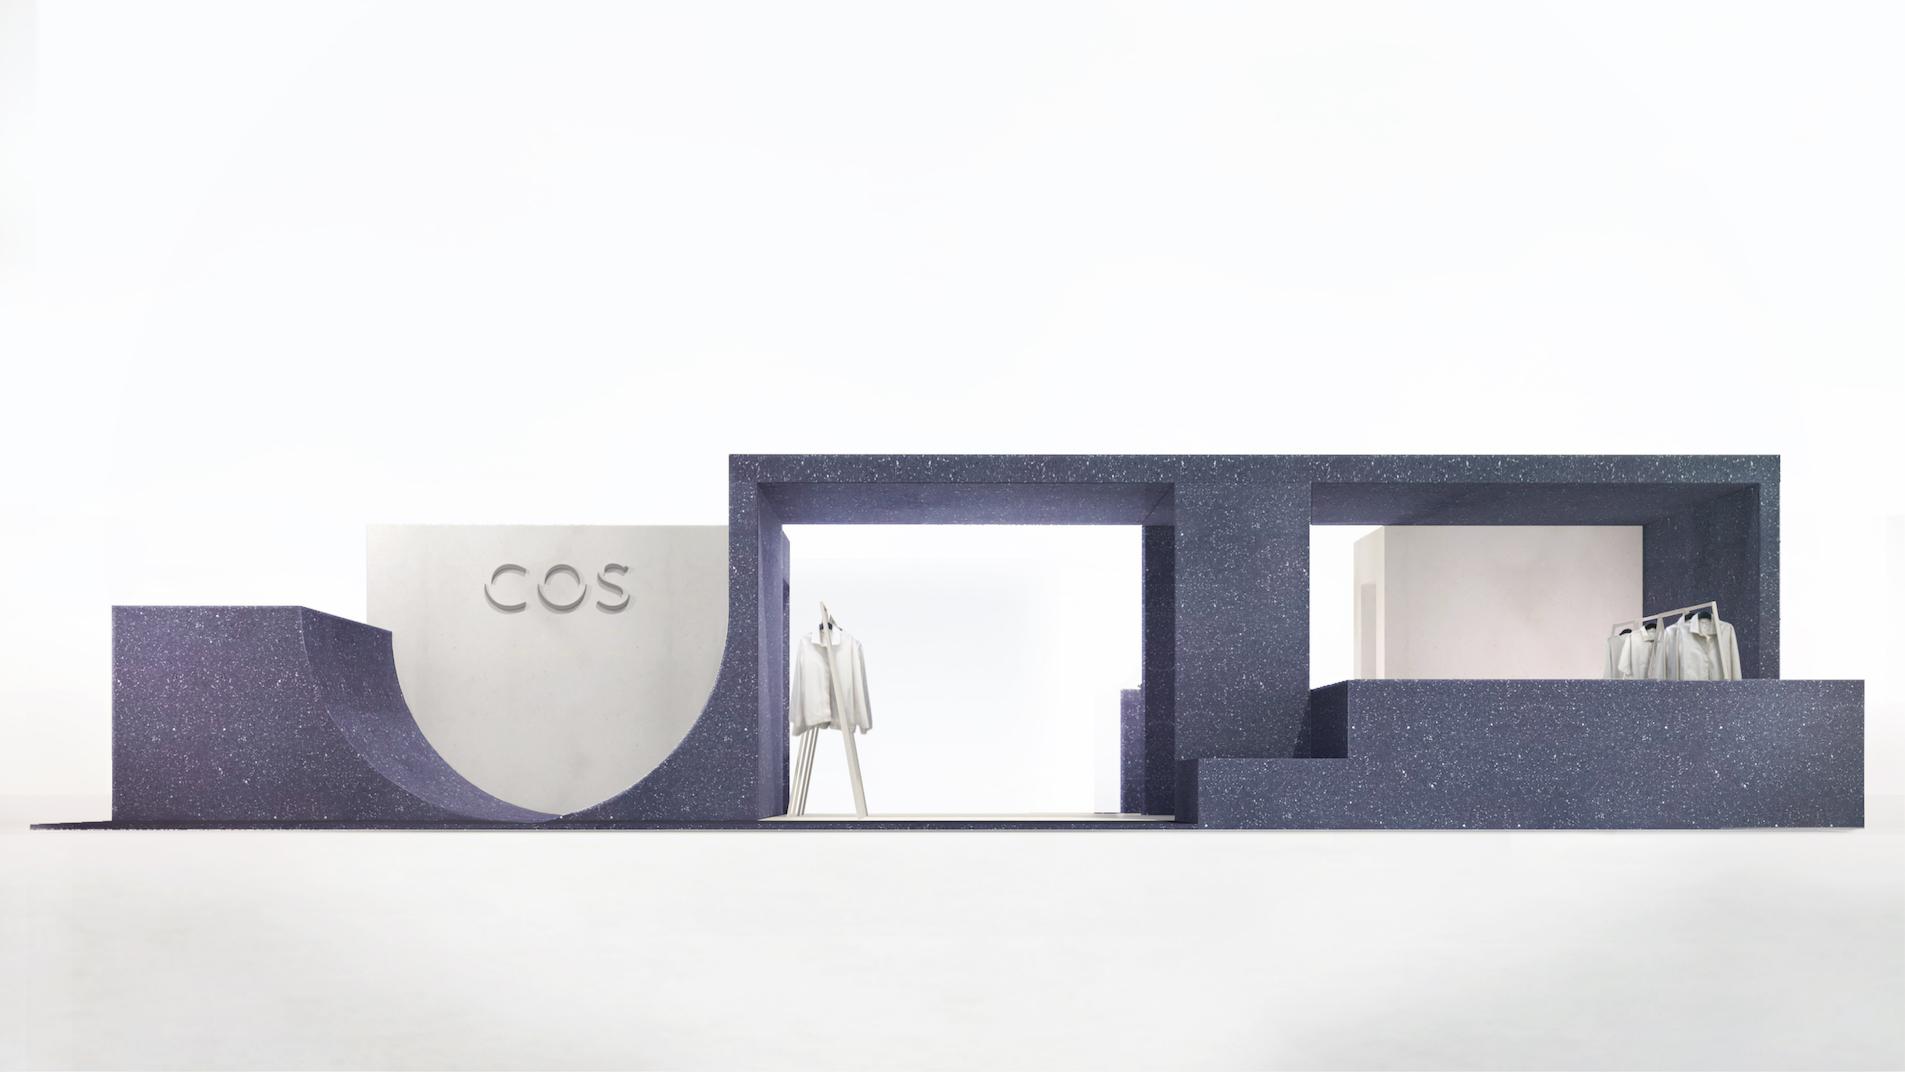 COS、西日本初のポップアップ開催 日本限定コレクション先行発売も